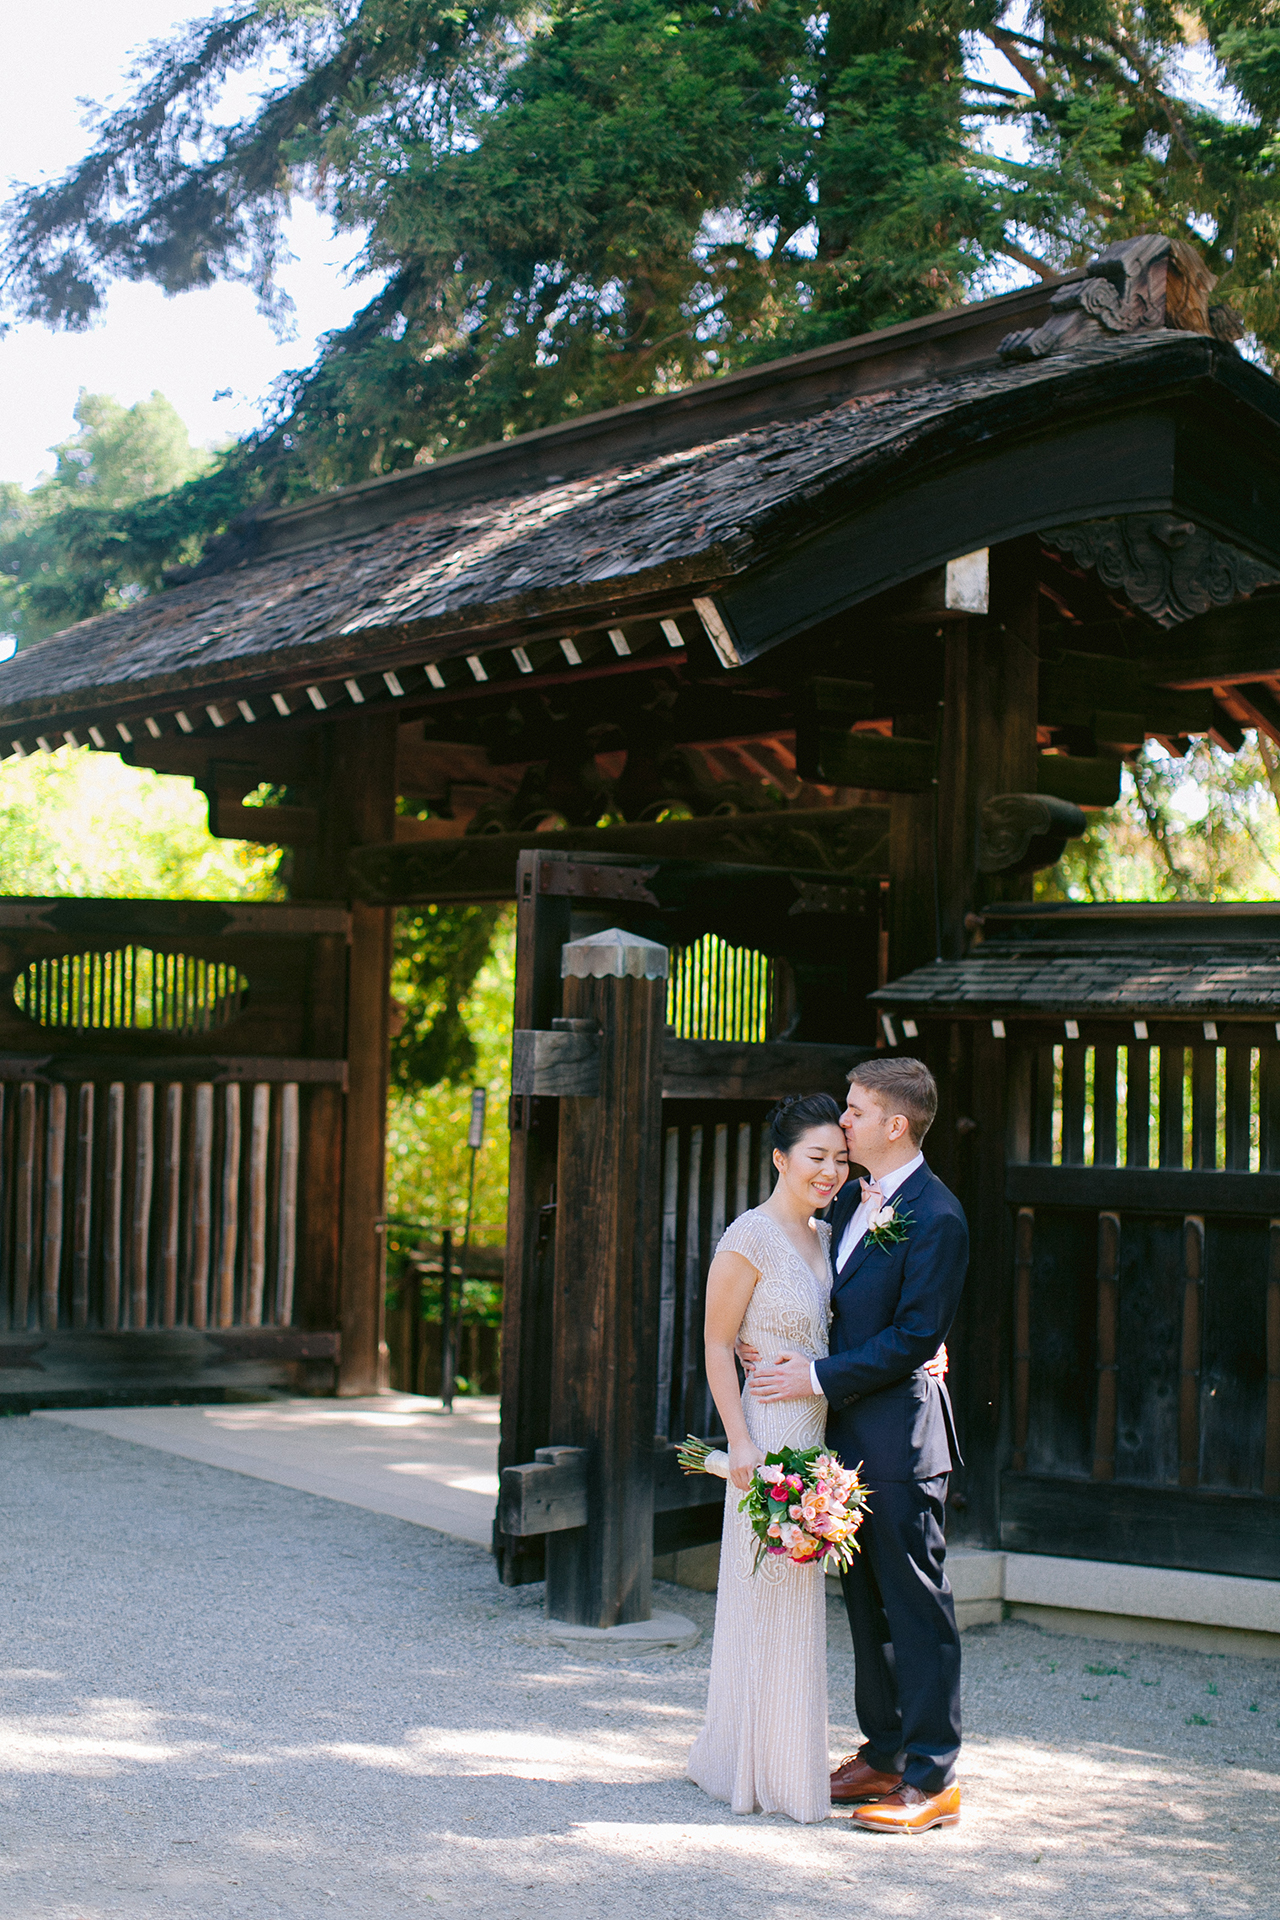 Hakone_Estate_and_Gardens_Wedding_010.jpg